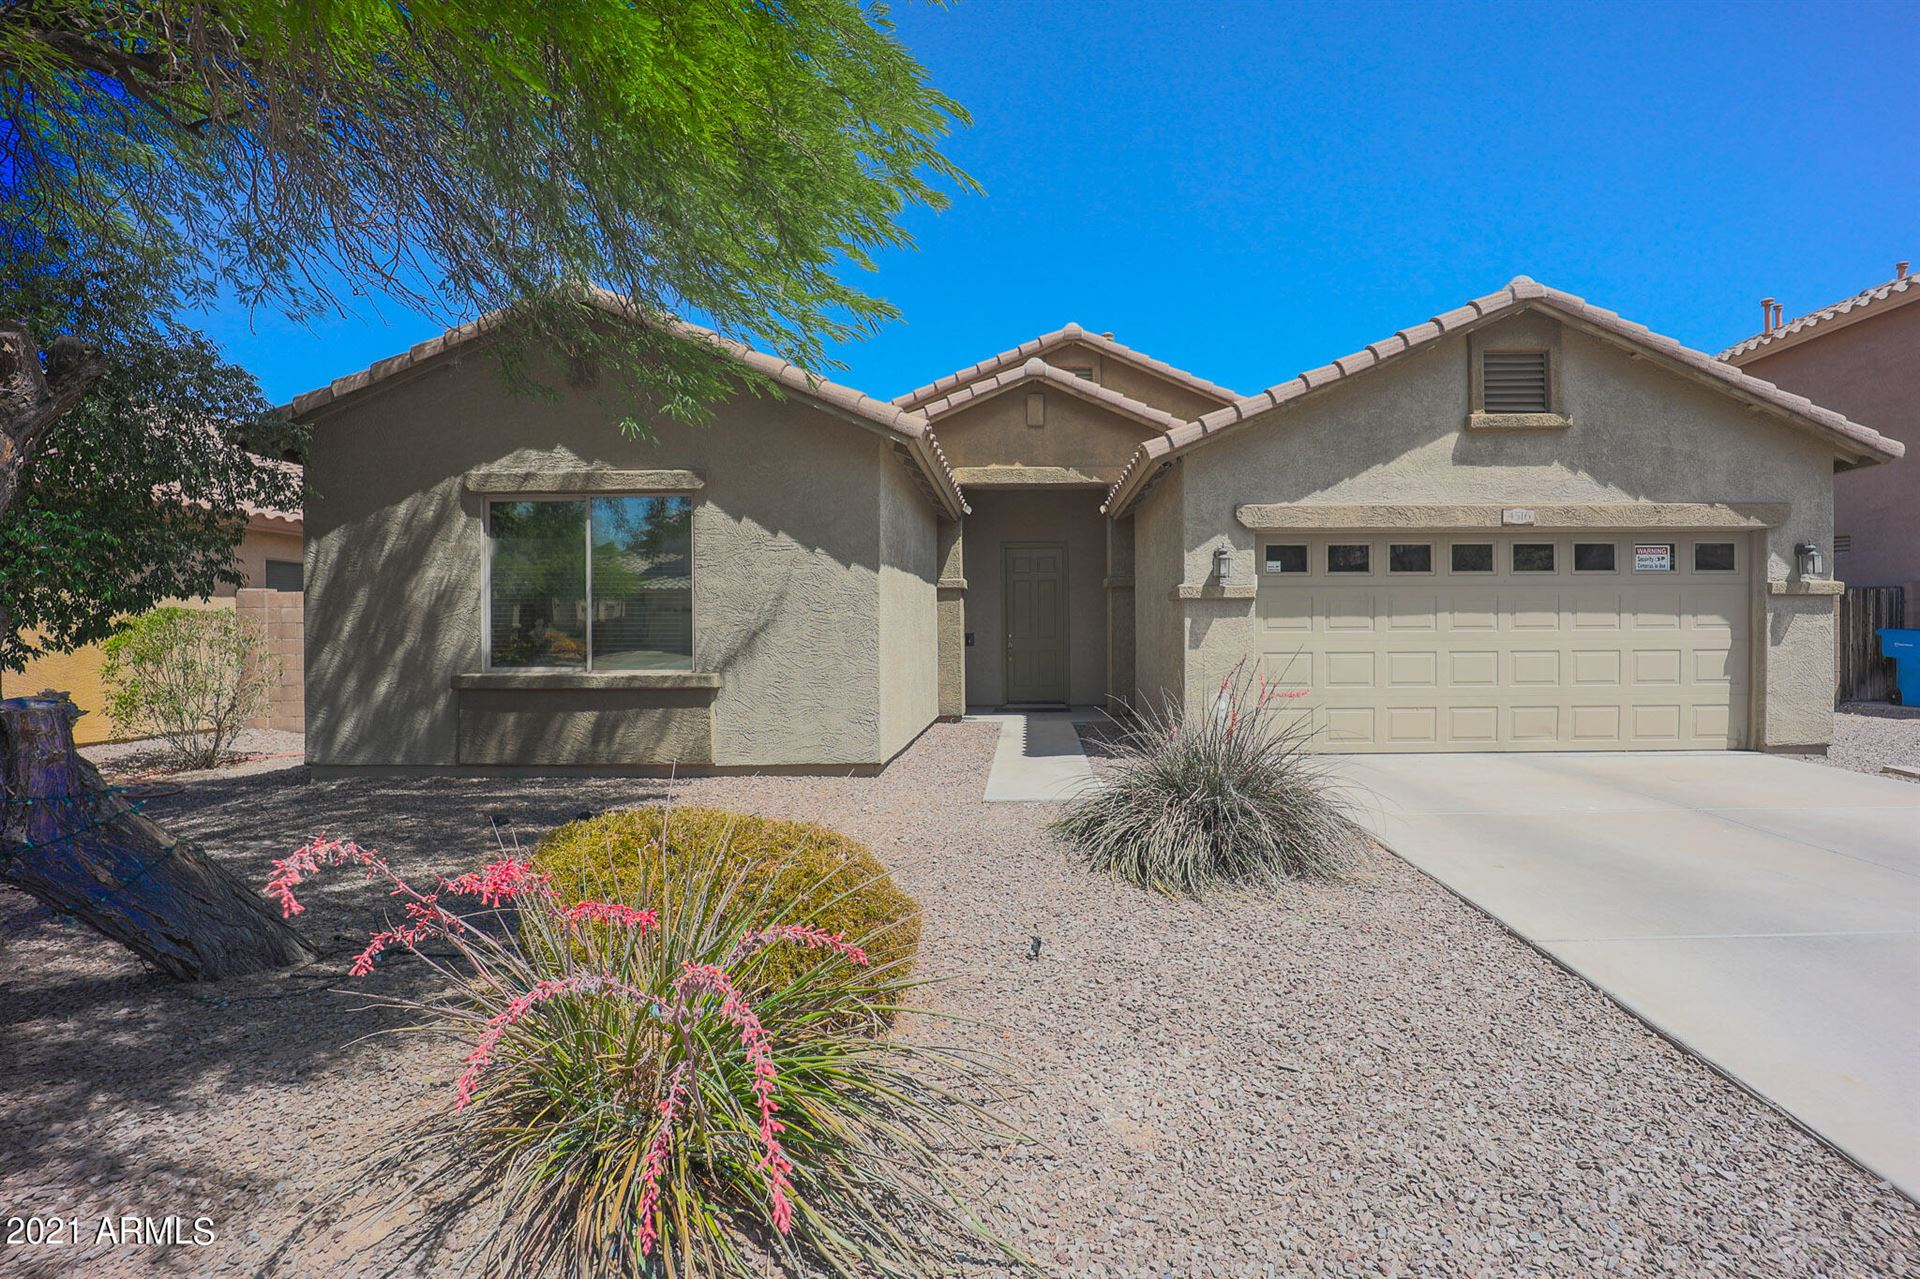 4516 W DONNER Drive, Laveen, AZ 85339 - MLS#: 6233116